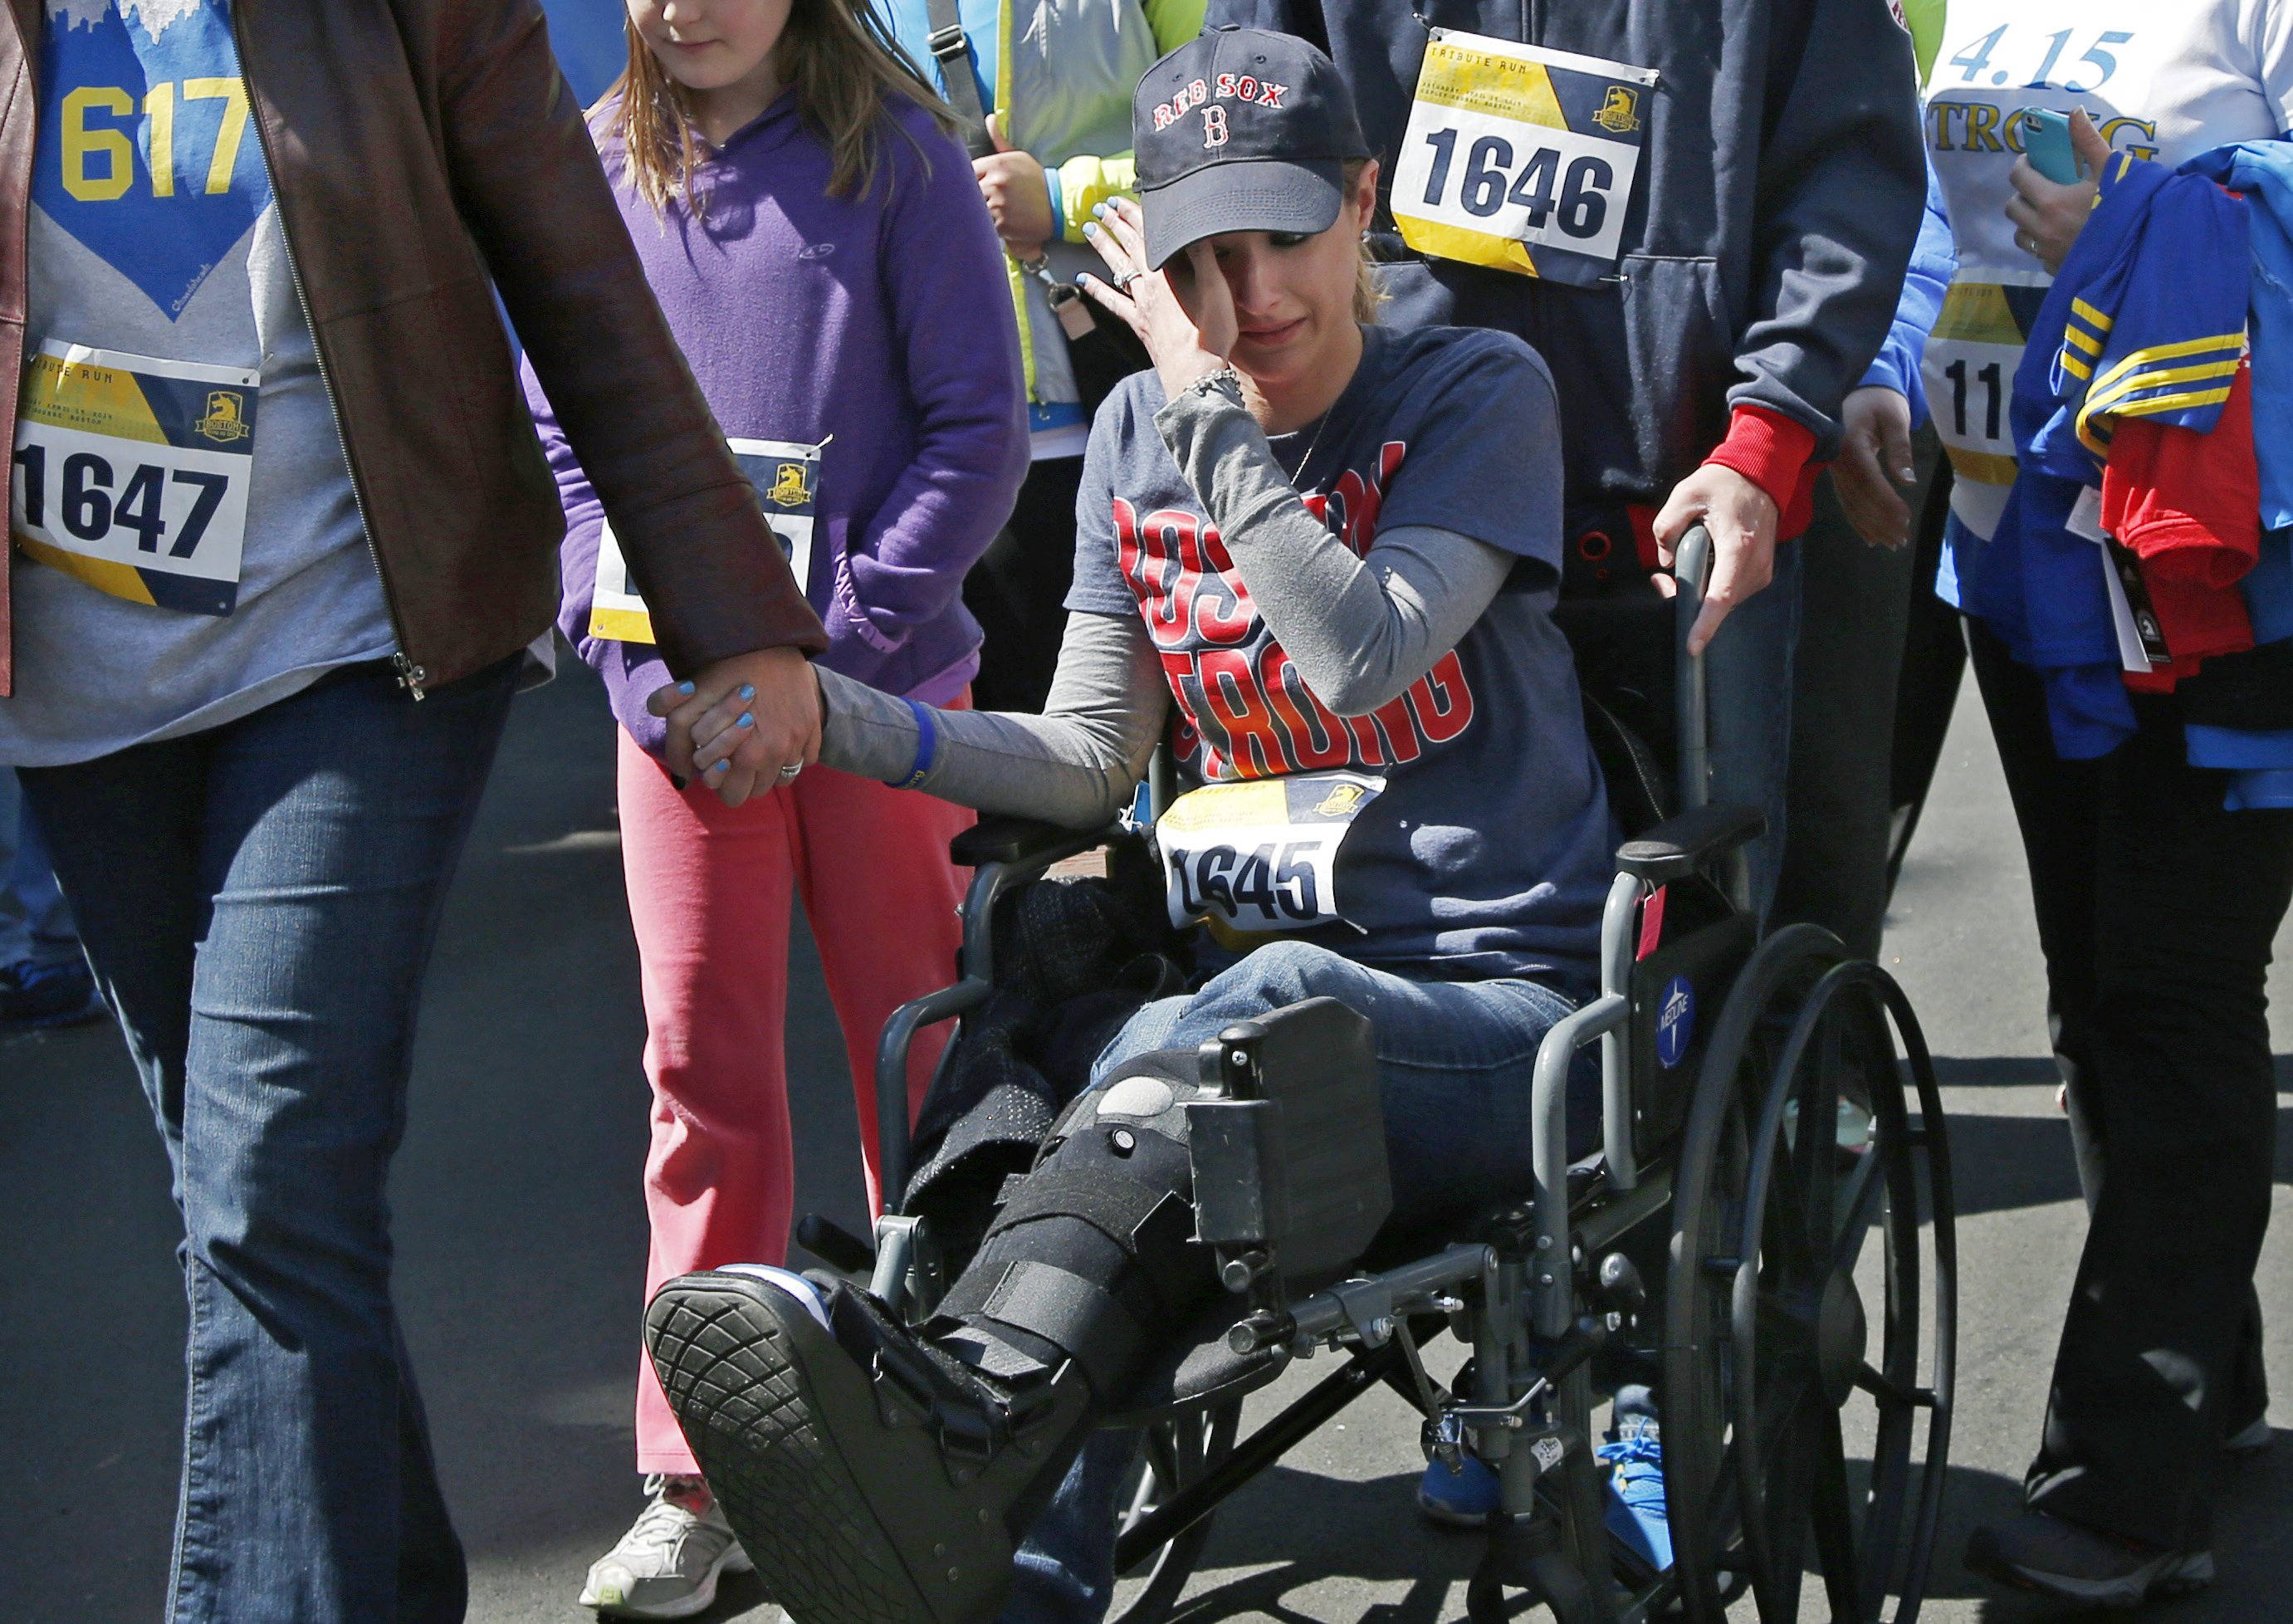 Boston Marathon Bombing Survivor Rebekah Gregory Writes